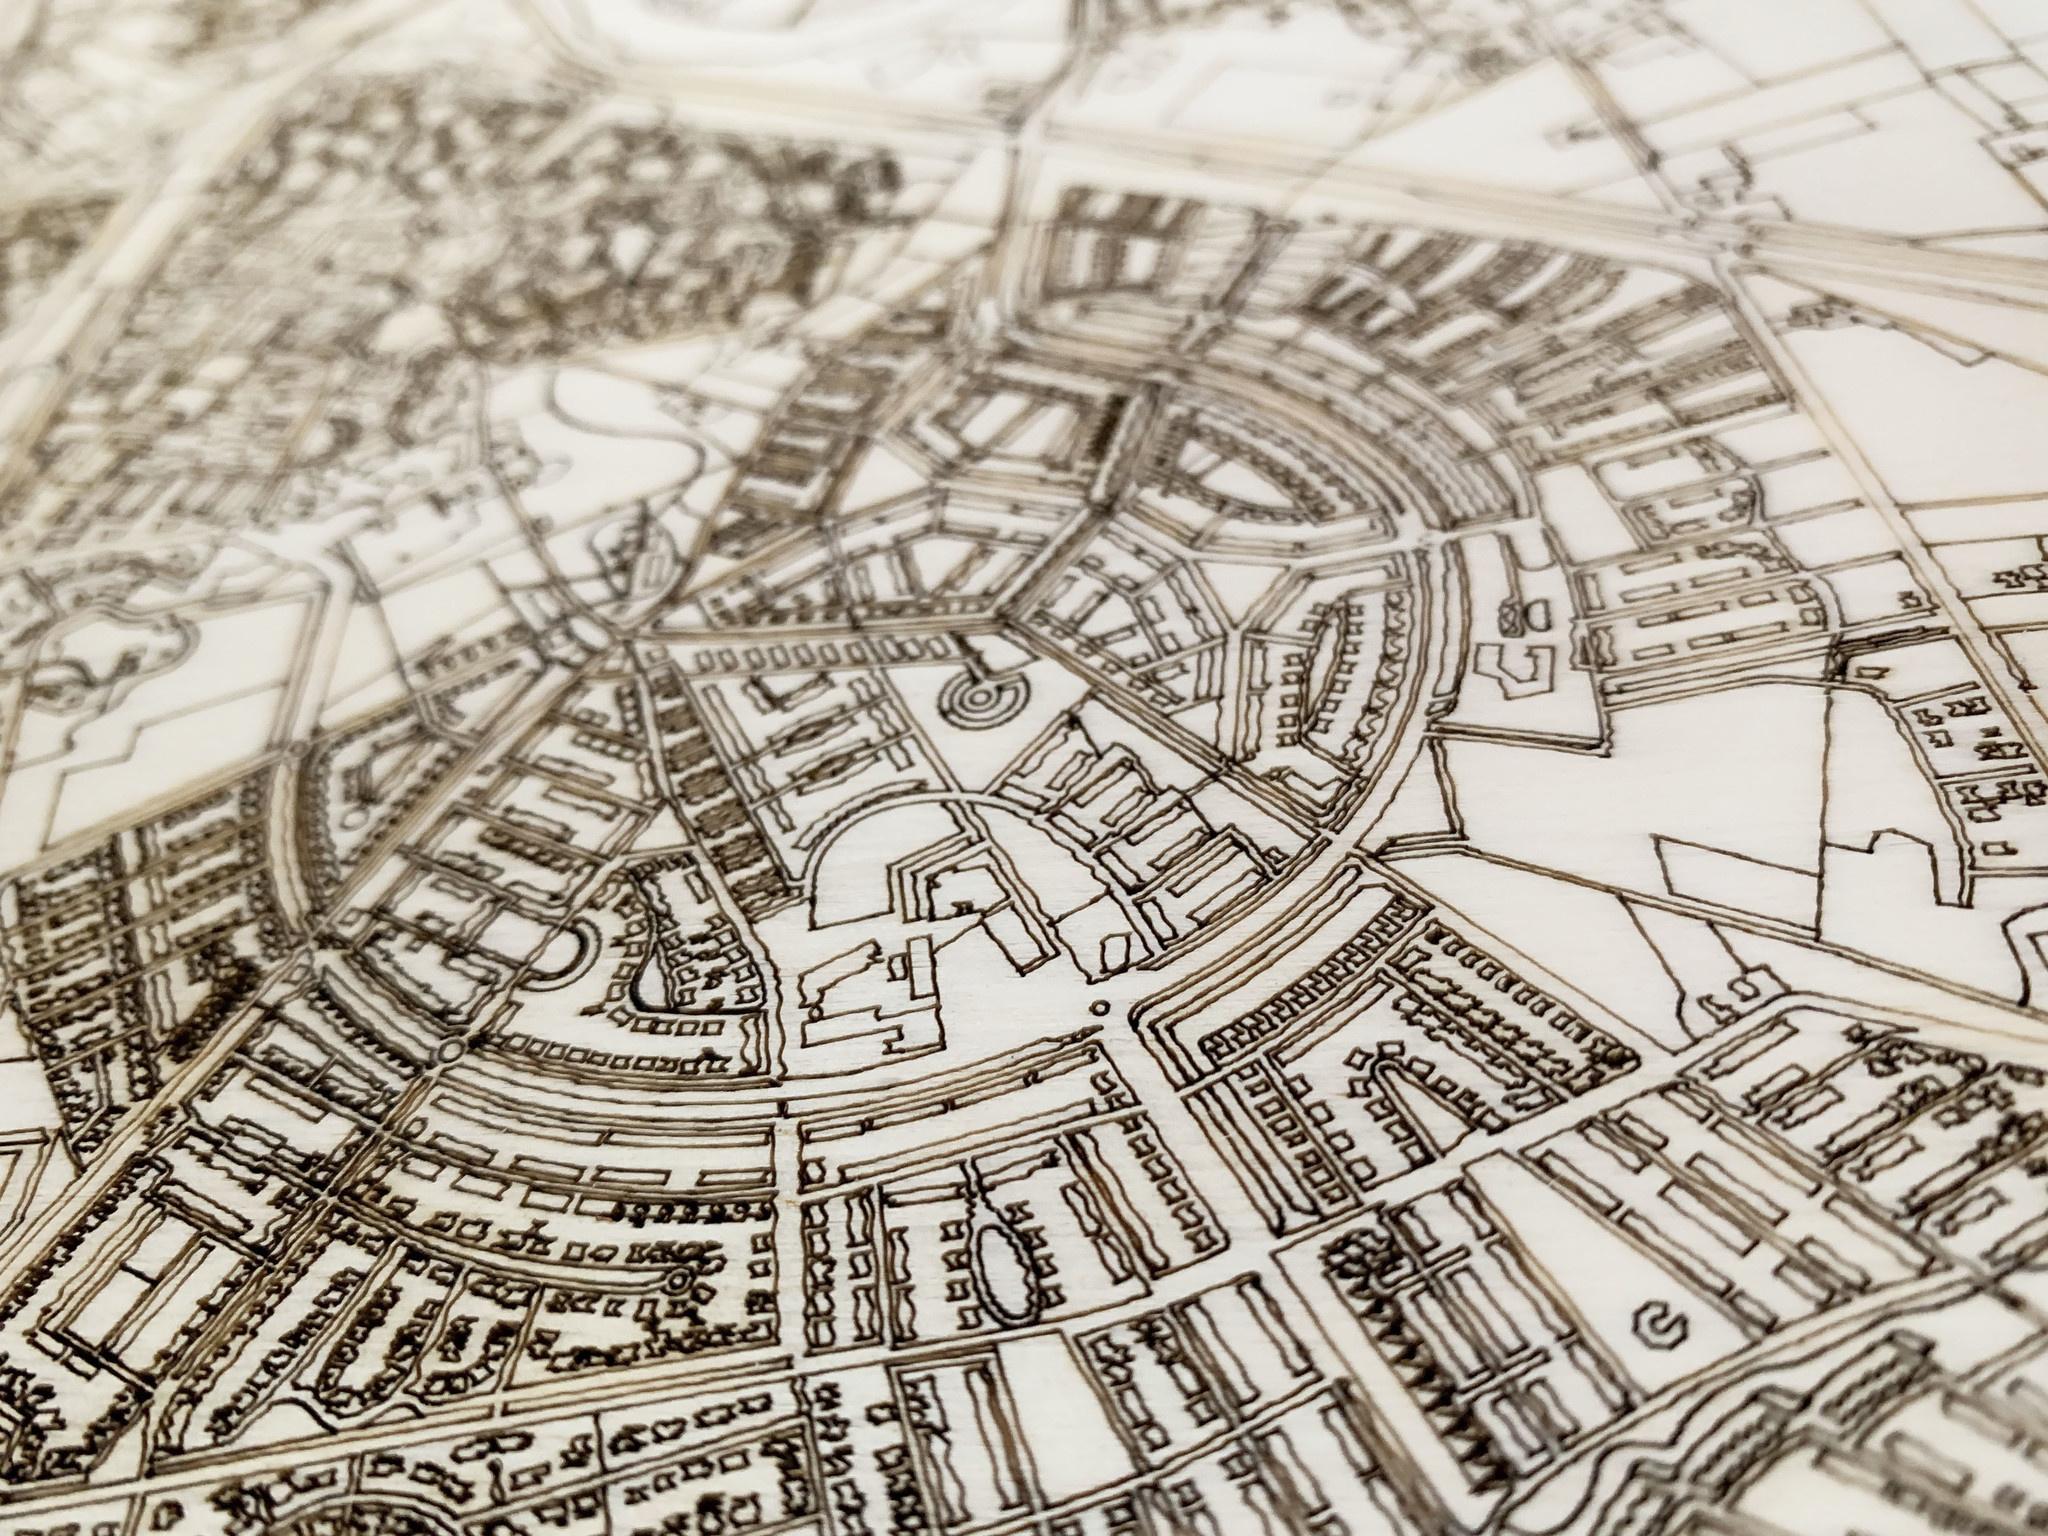 Stadtplan Diemen | Wanddekoration Holz-4